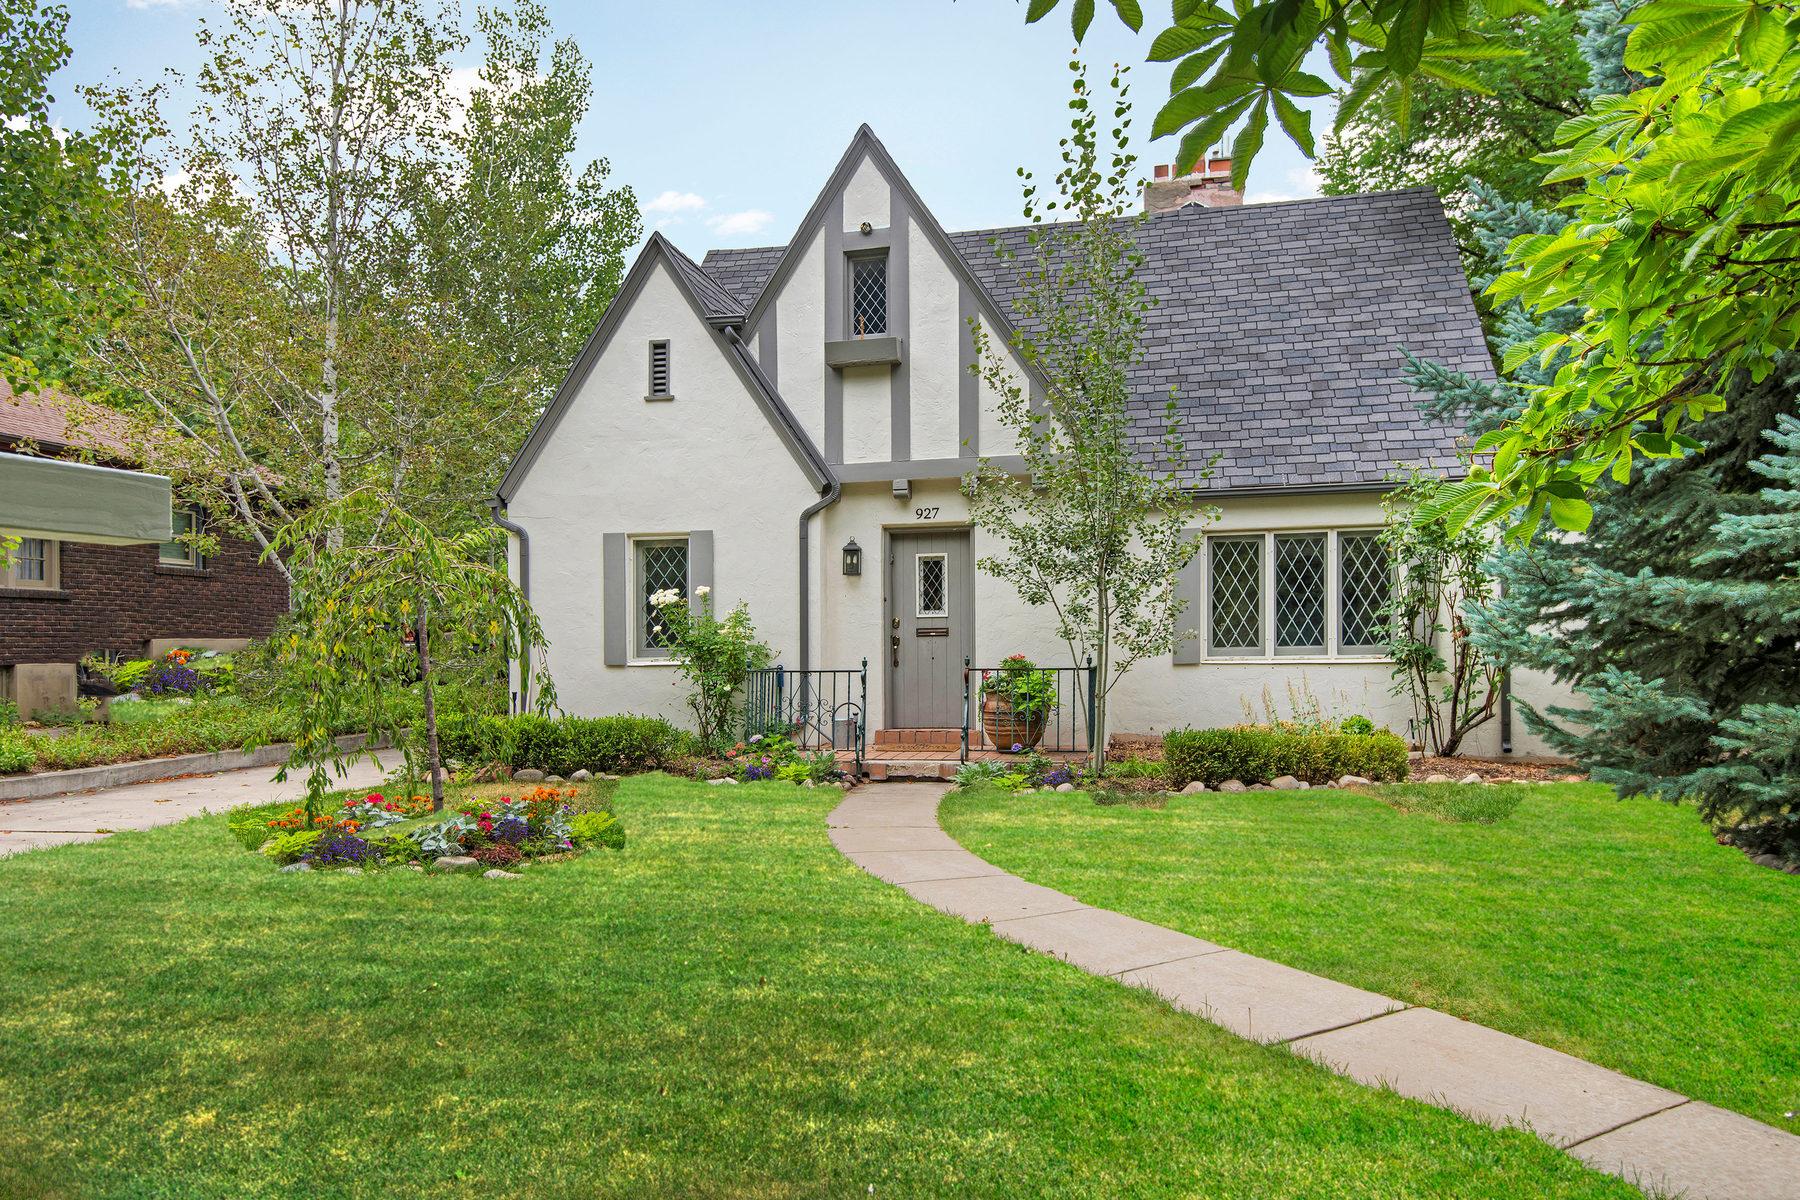 Villa per Vendita alle ore Rare Remodeled Tudor Secluded On Red Butte Creek 927 S Diestel Rd Salt Lake City, Utah 84105 Stati Uniti